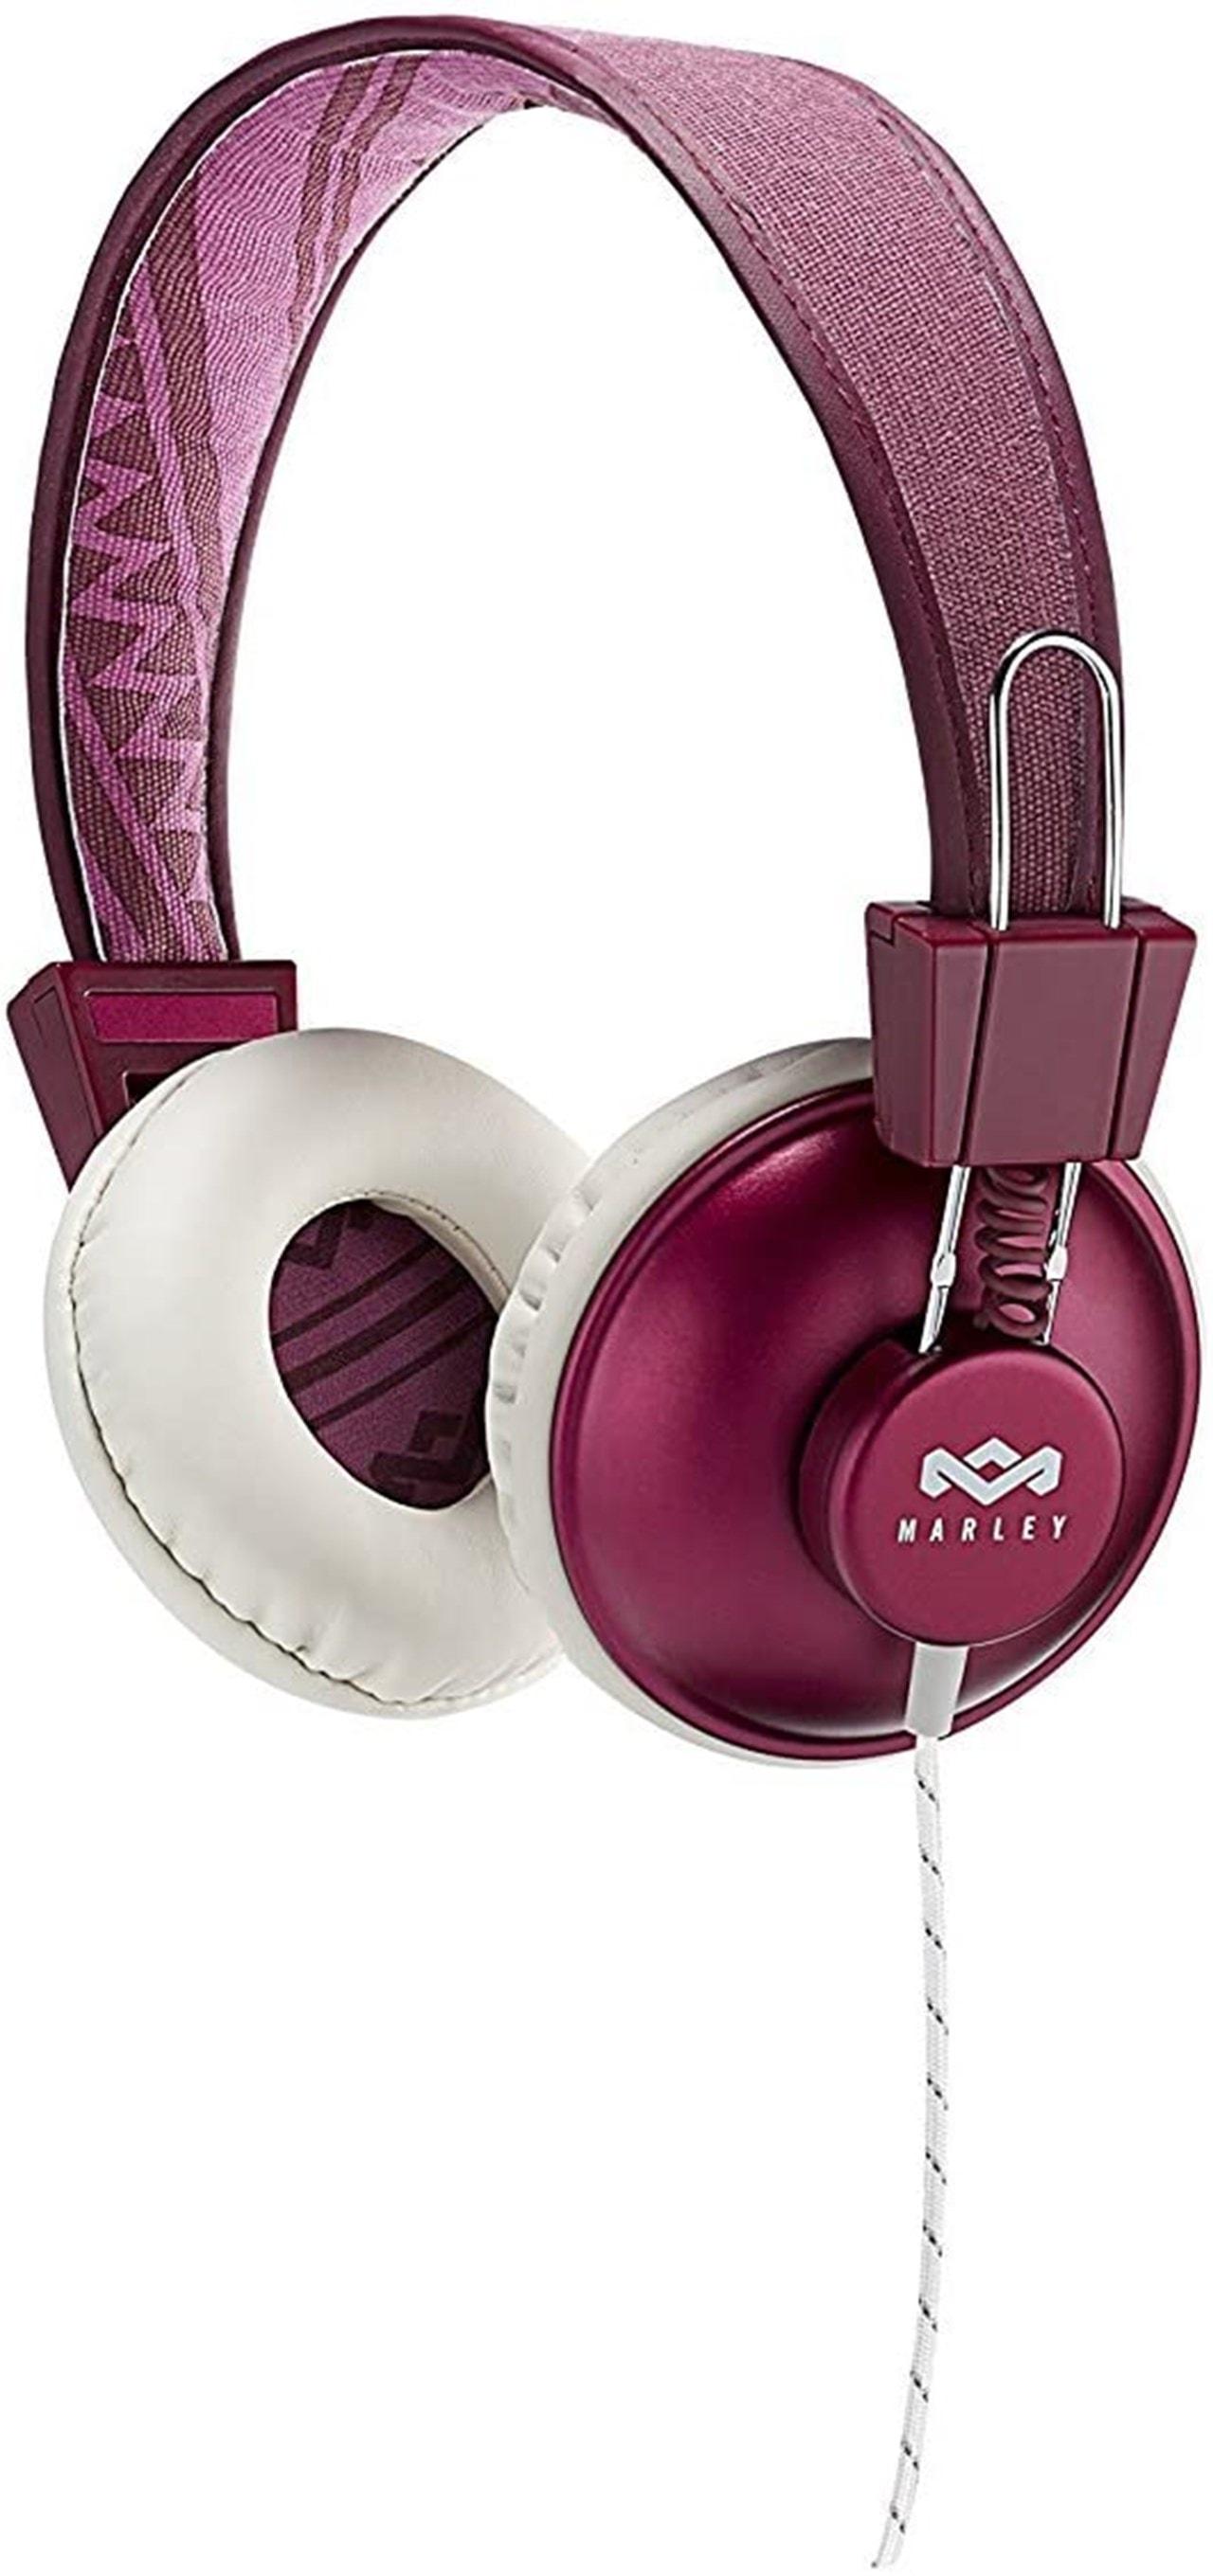 House Of Marley Positive Vibration Purple Headphones W/Mic (hmv Exclusive) - 1